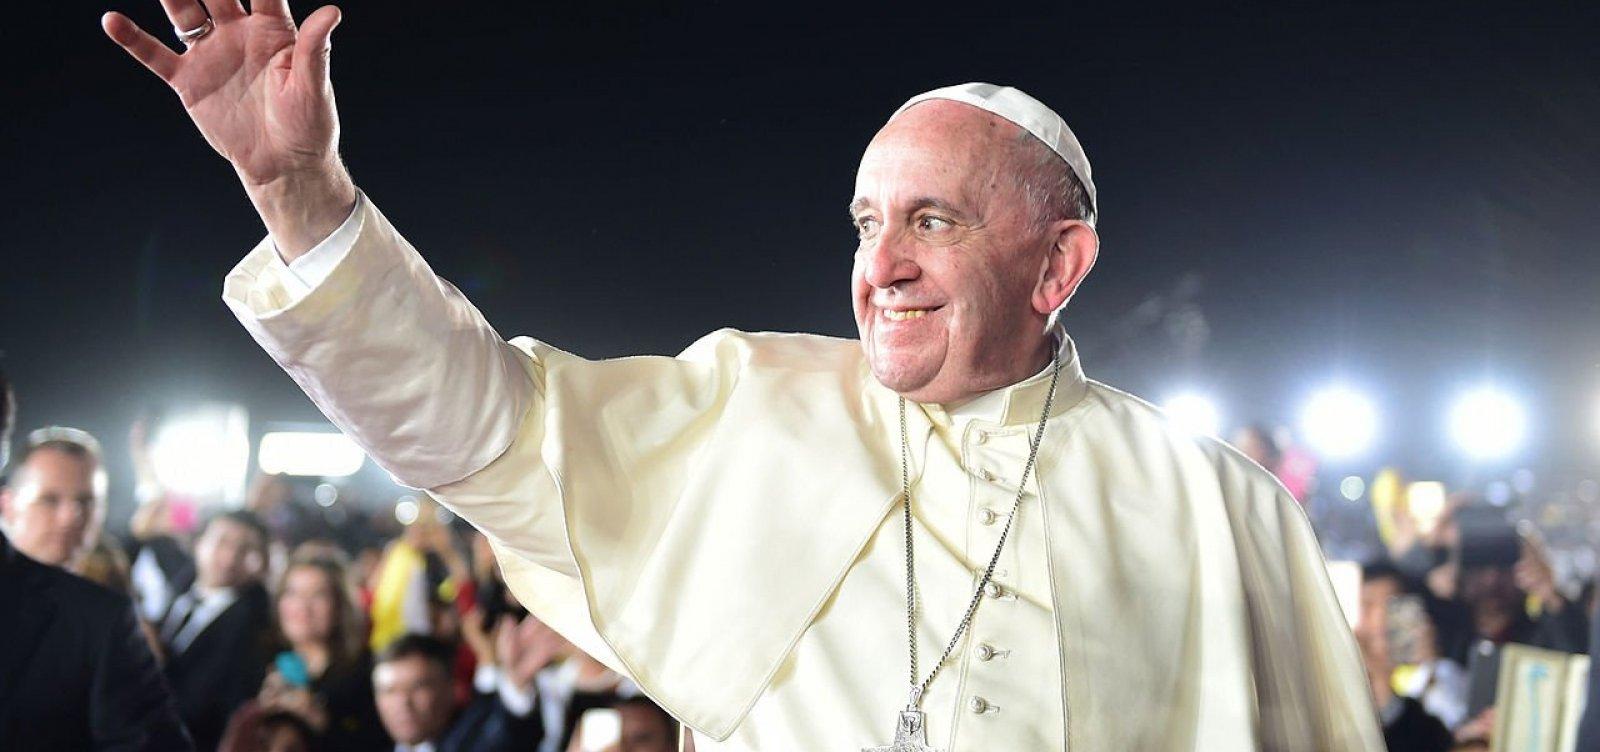 [Papa Francisco emite decreto que obriga bispos a denunciar casos de abuso sexual]